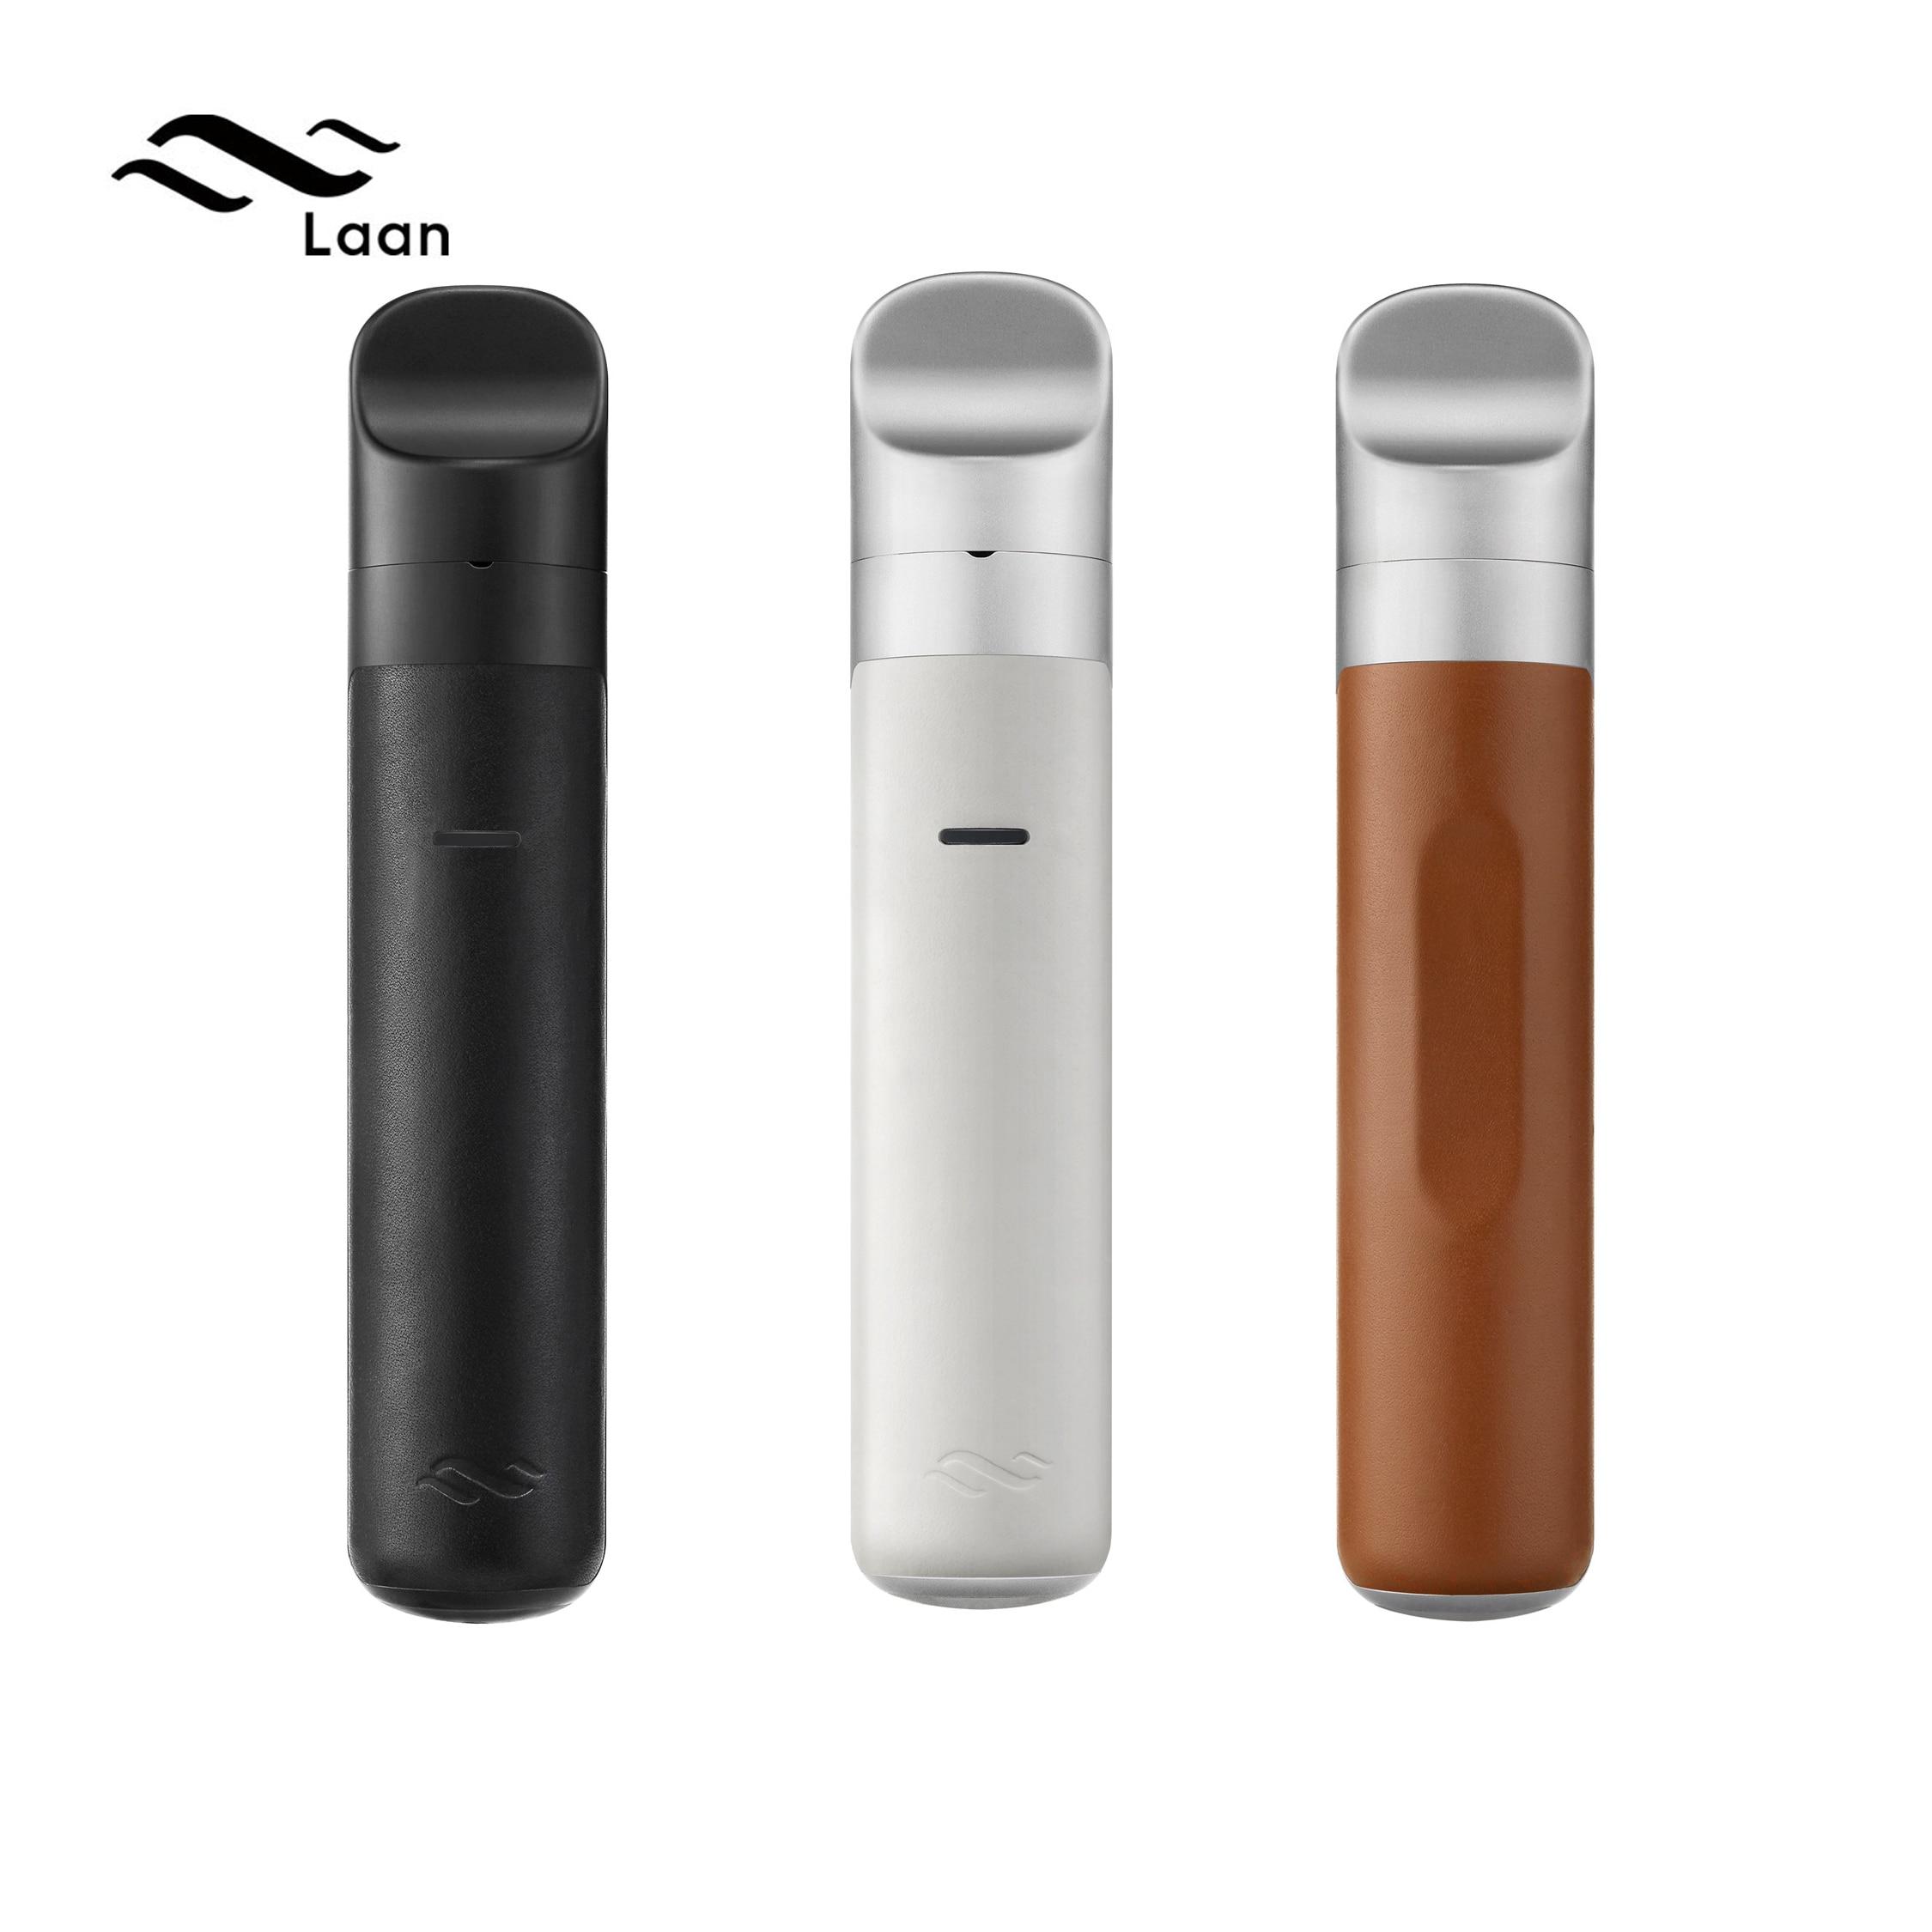 Vape Pen Shanlaan Laan Pod Mod Electronic Cigarettes 1300mah 40W Starter Kit Cartridge All In One Vape Vaporizer